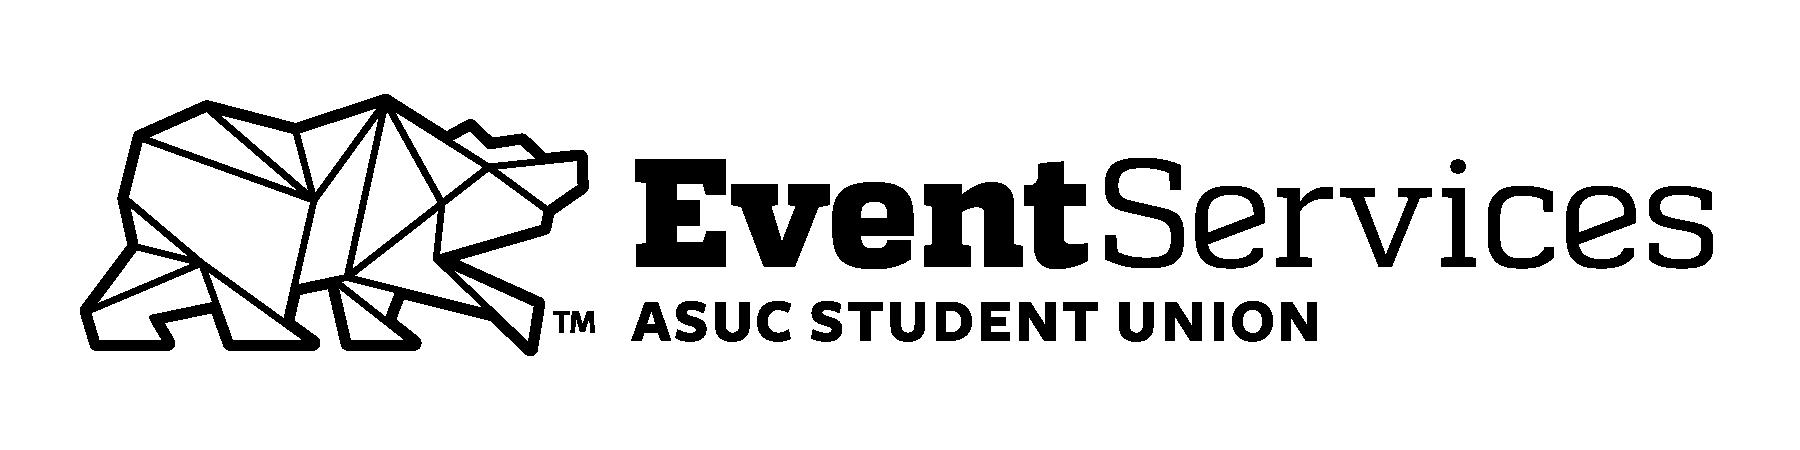 Download event services logo Horizontal Black